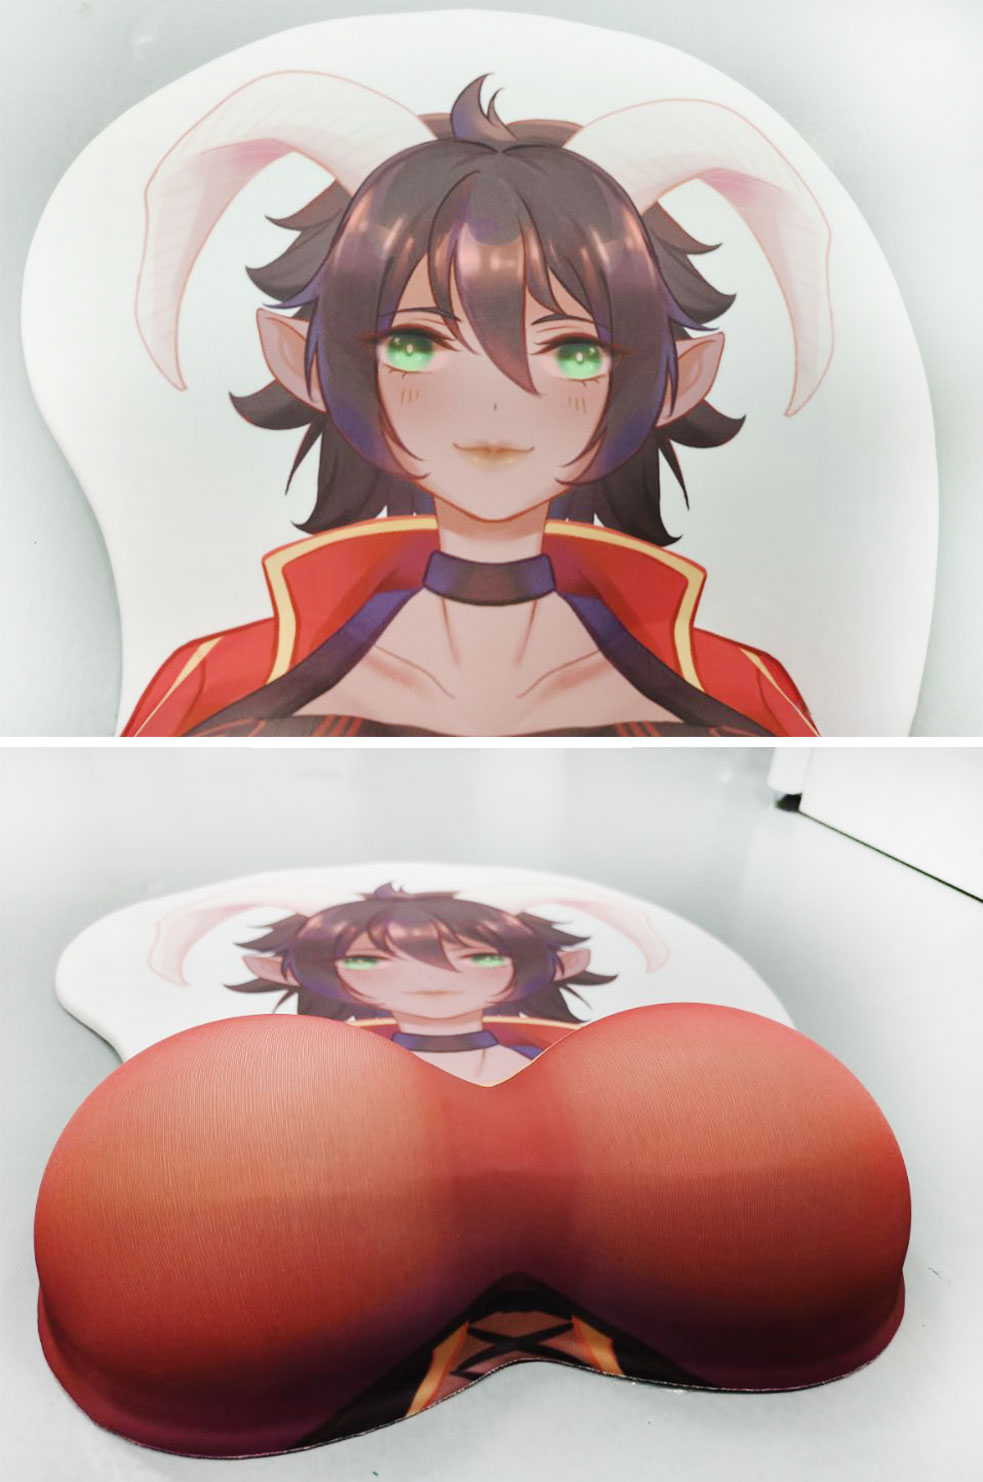 kda ahri life size oppai mousepad ver1 8548 - Anime Mousepads